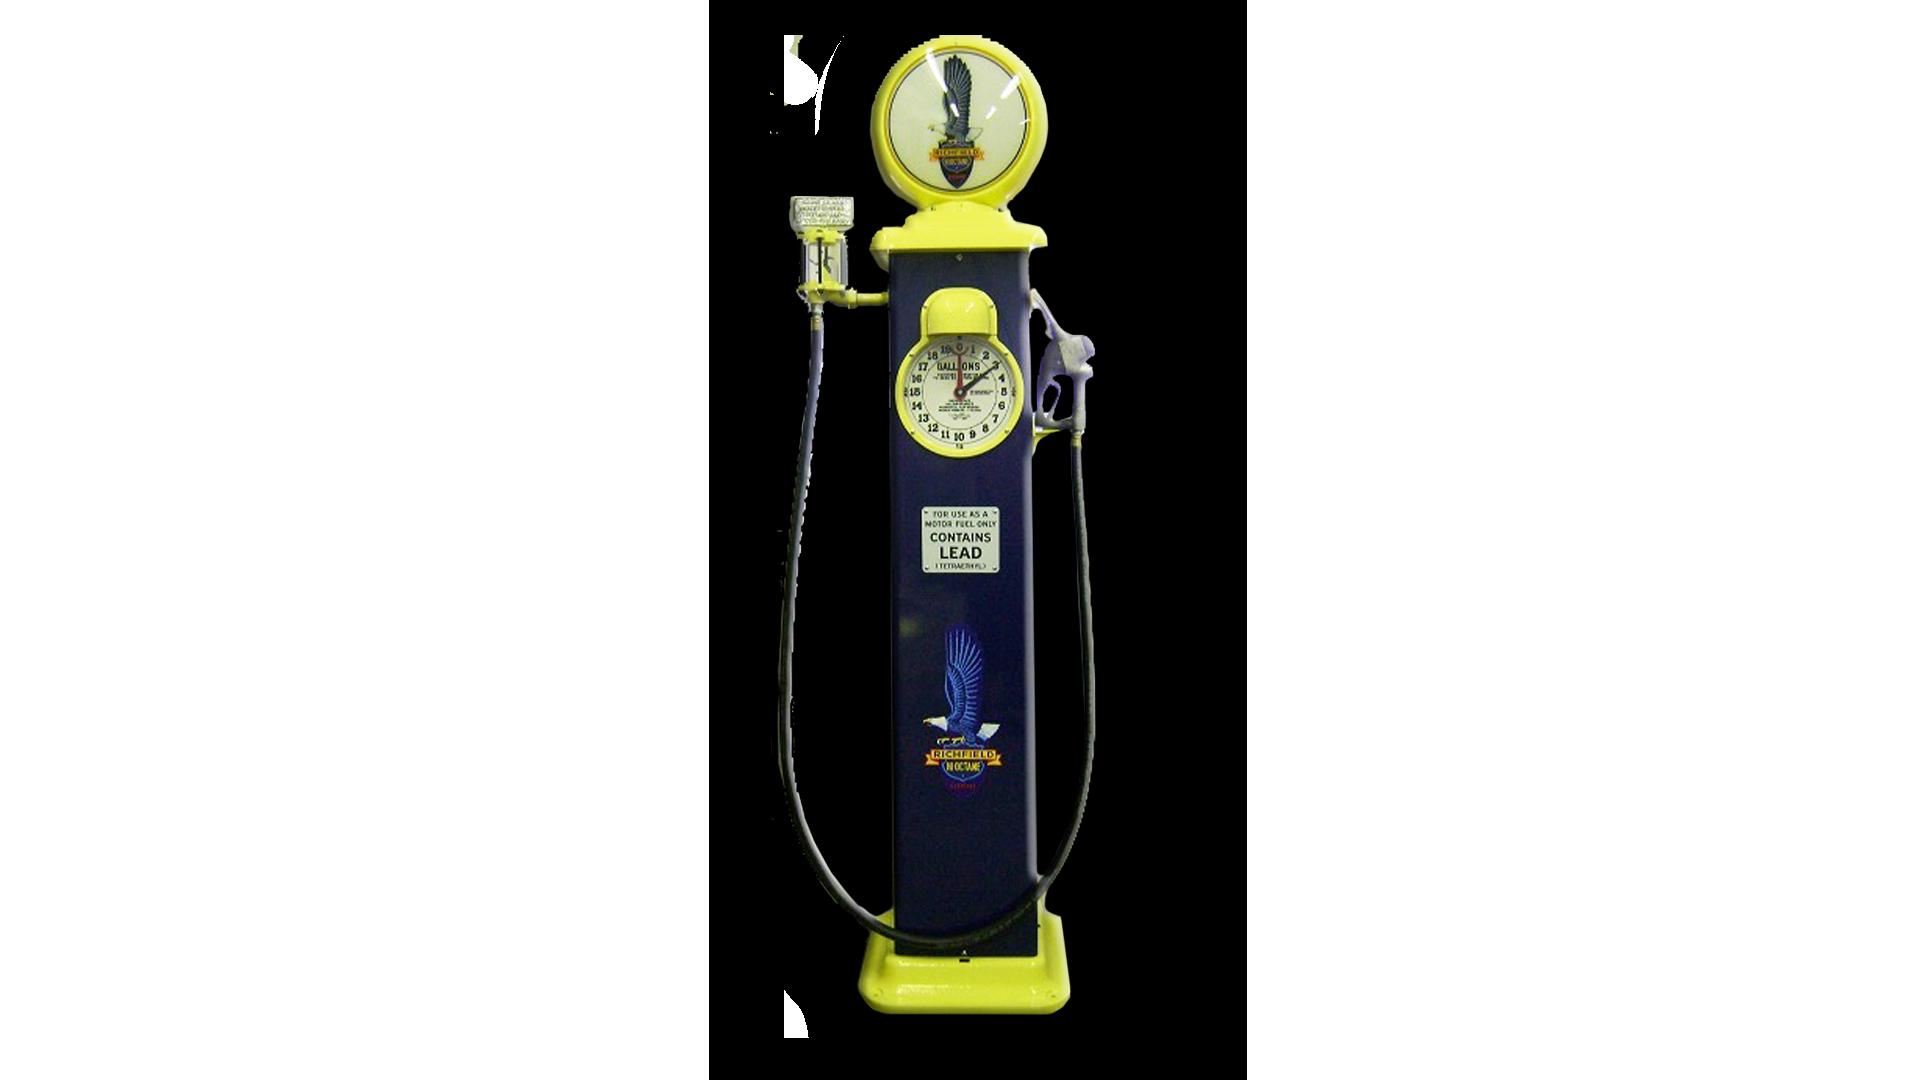 Richfield 1929 Clock Face Reproduction Gas Pump